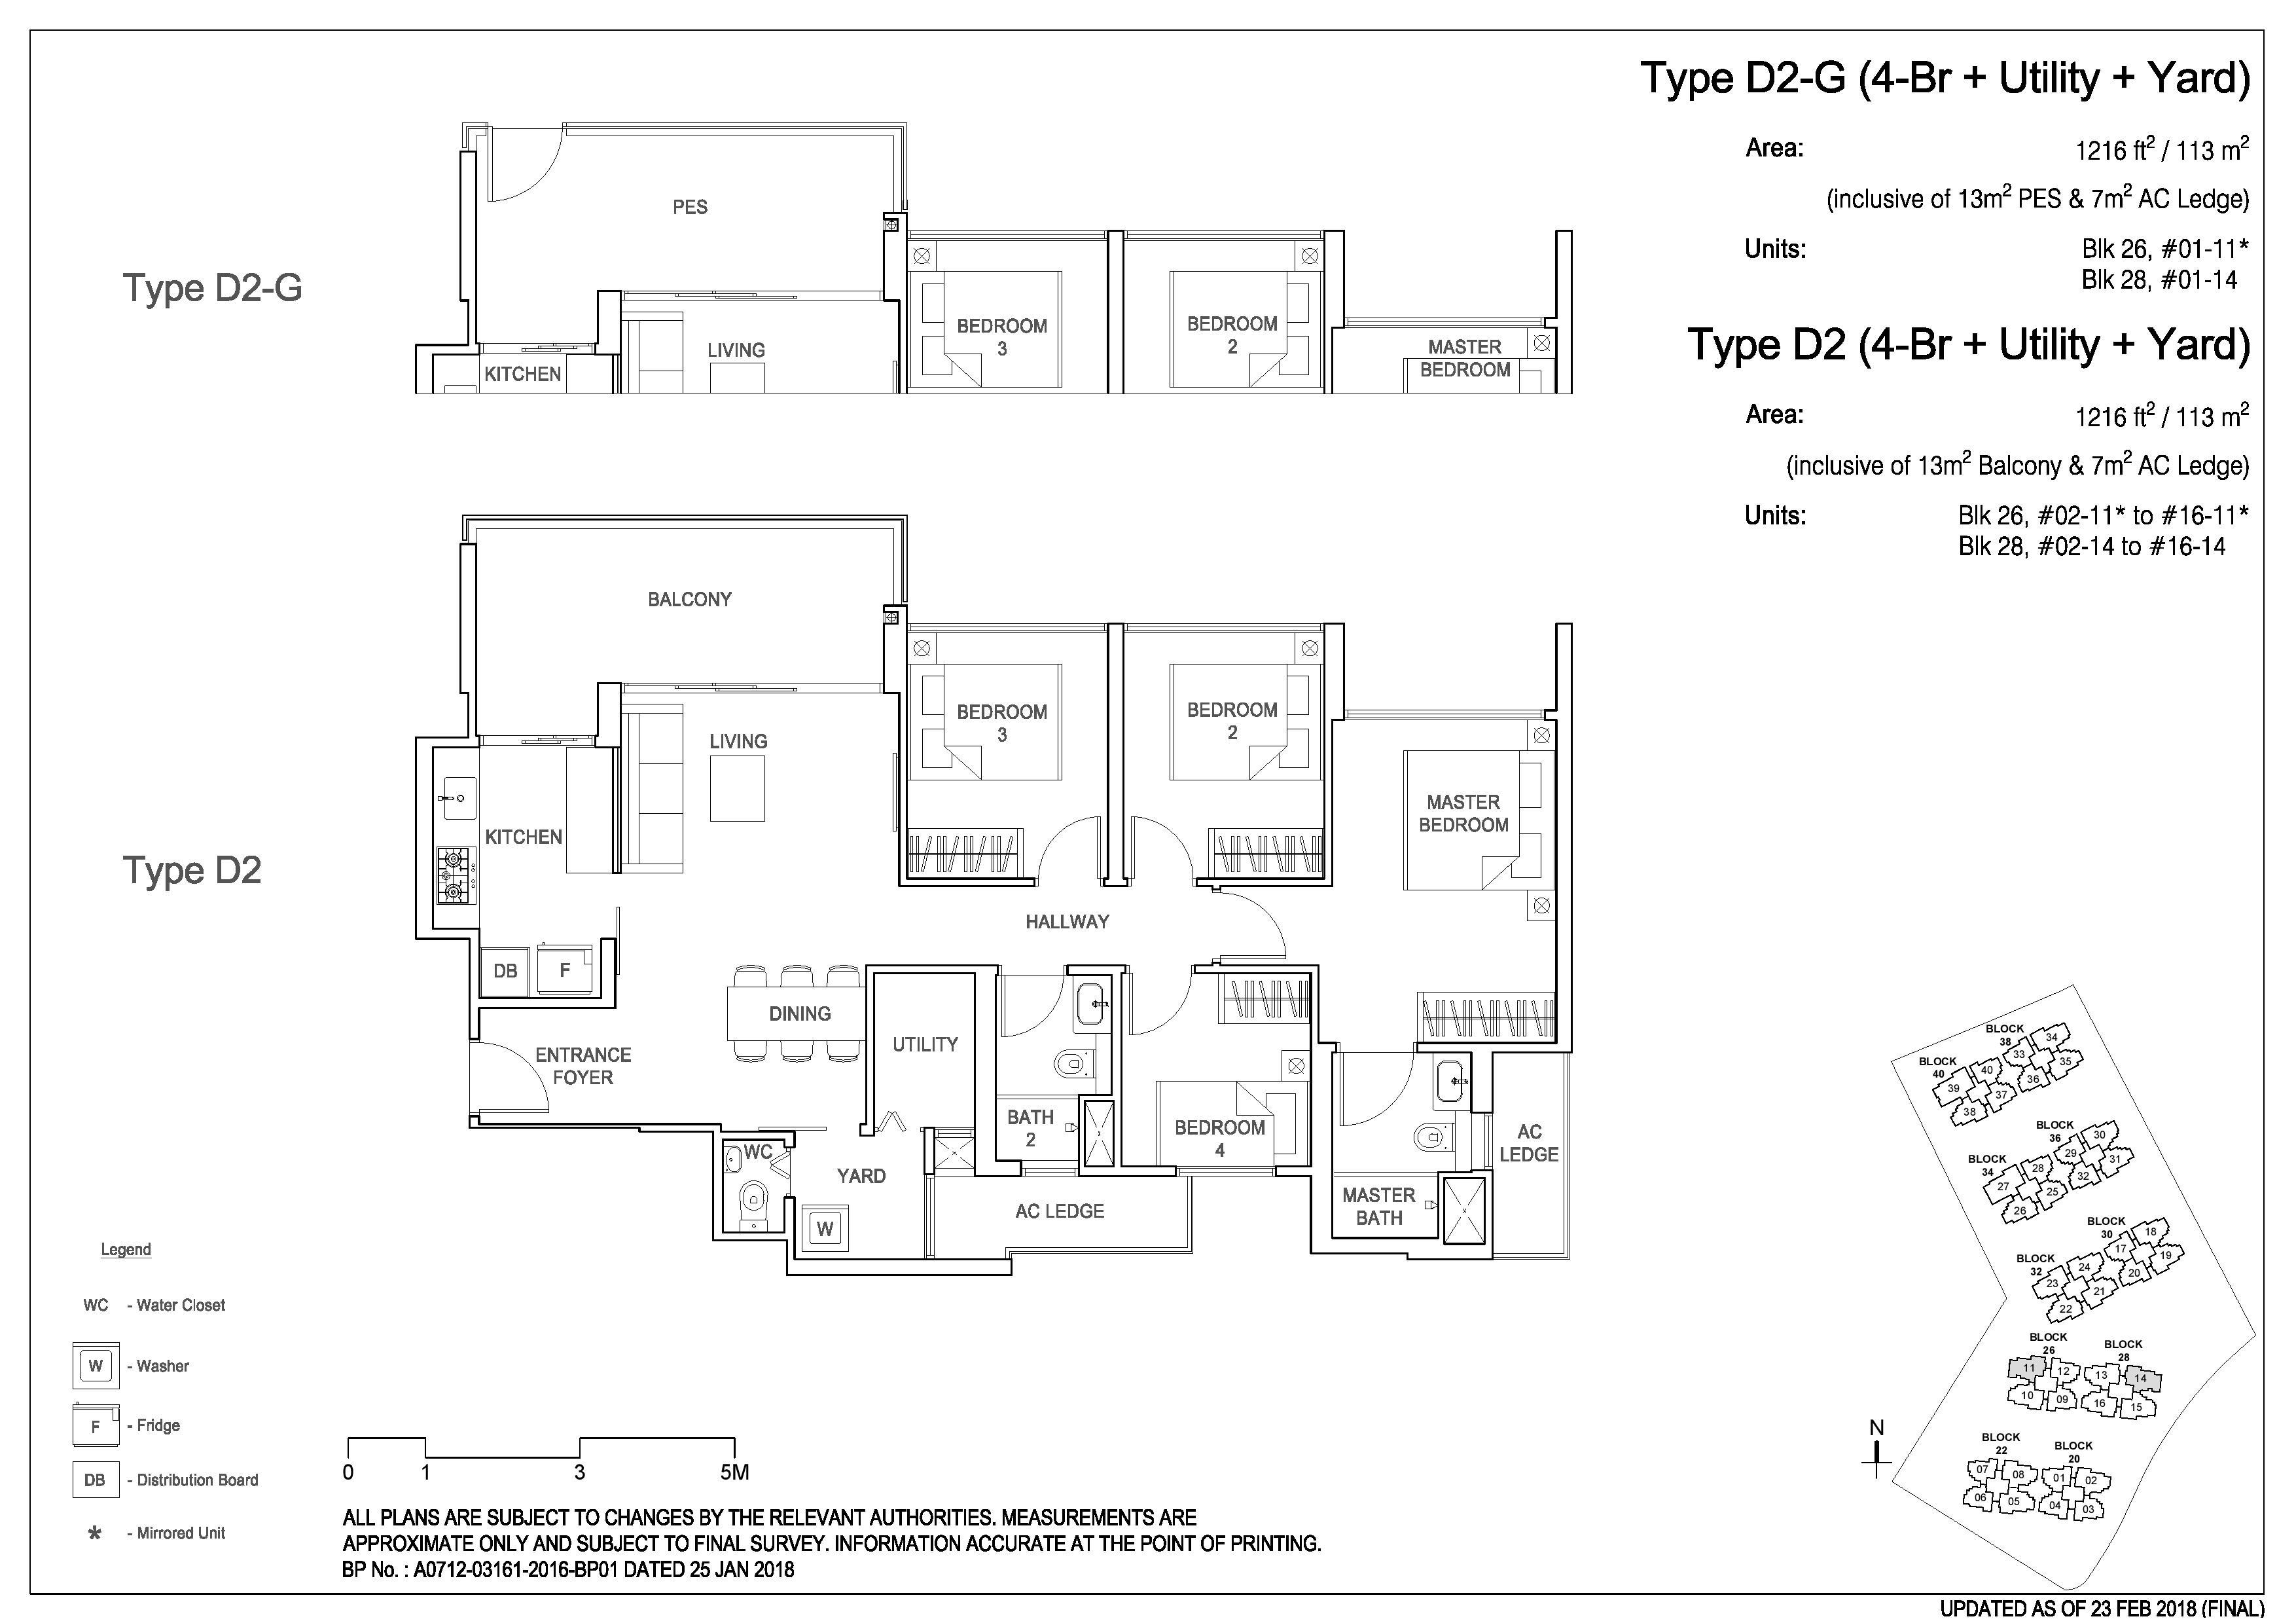 Rivercove 4 bedroom floor plan utility yard